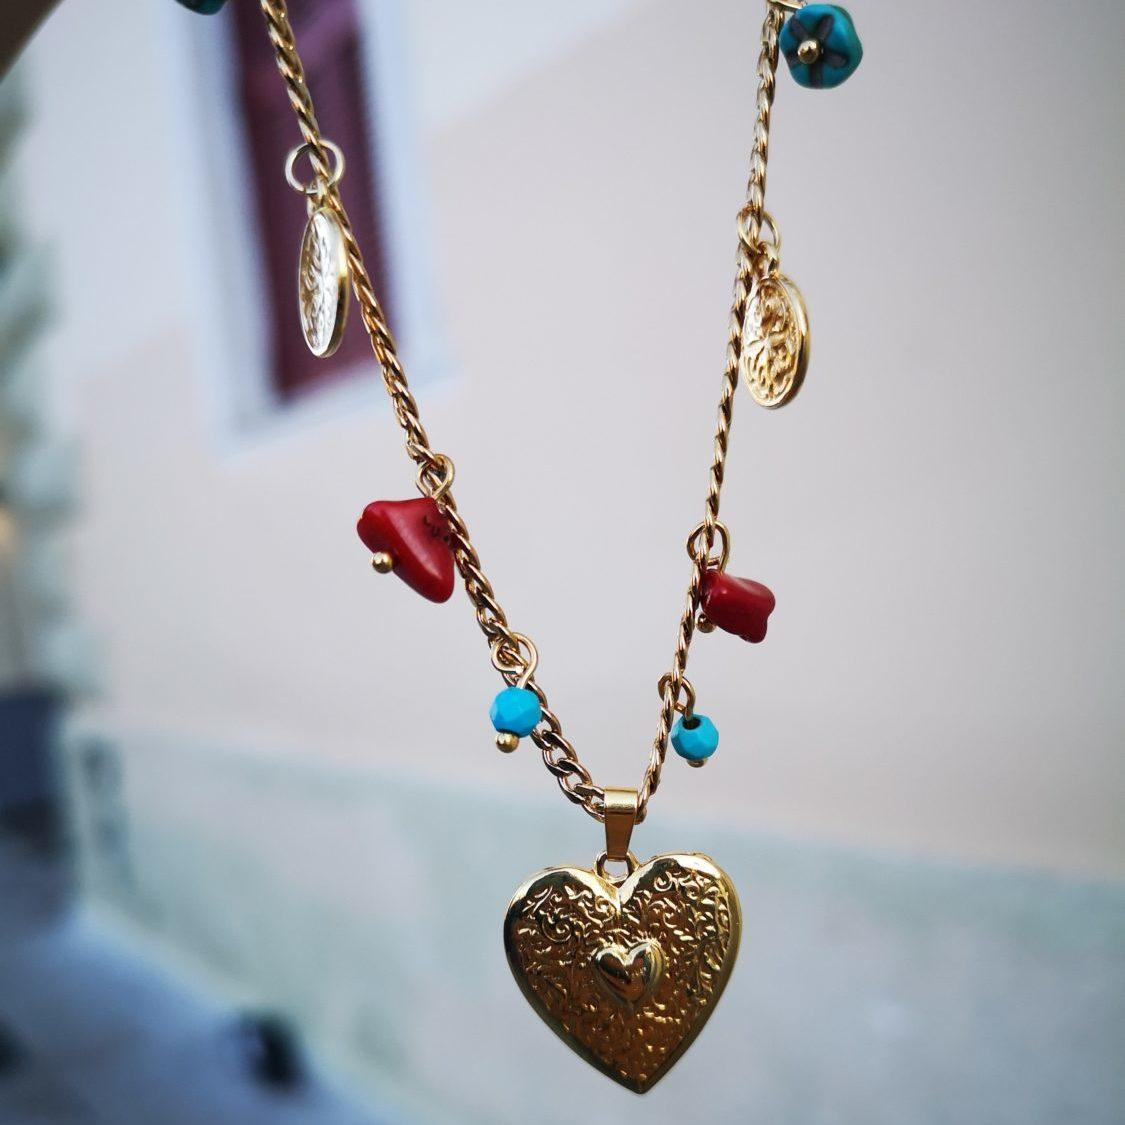 Samoa Heart Necklace